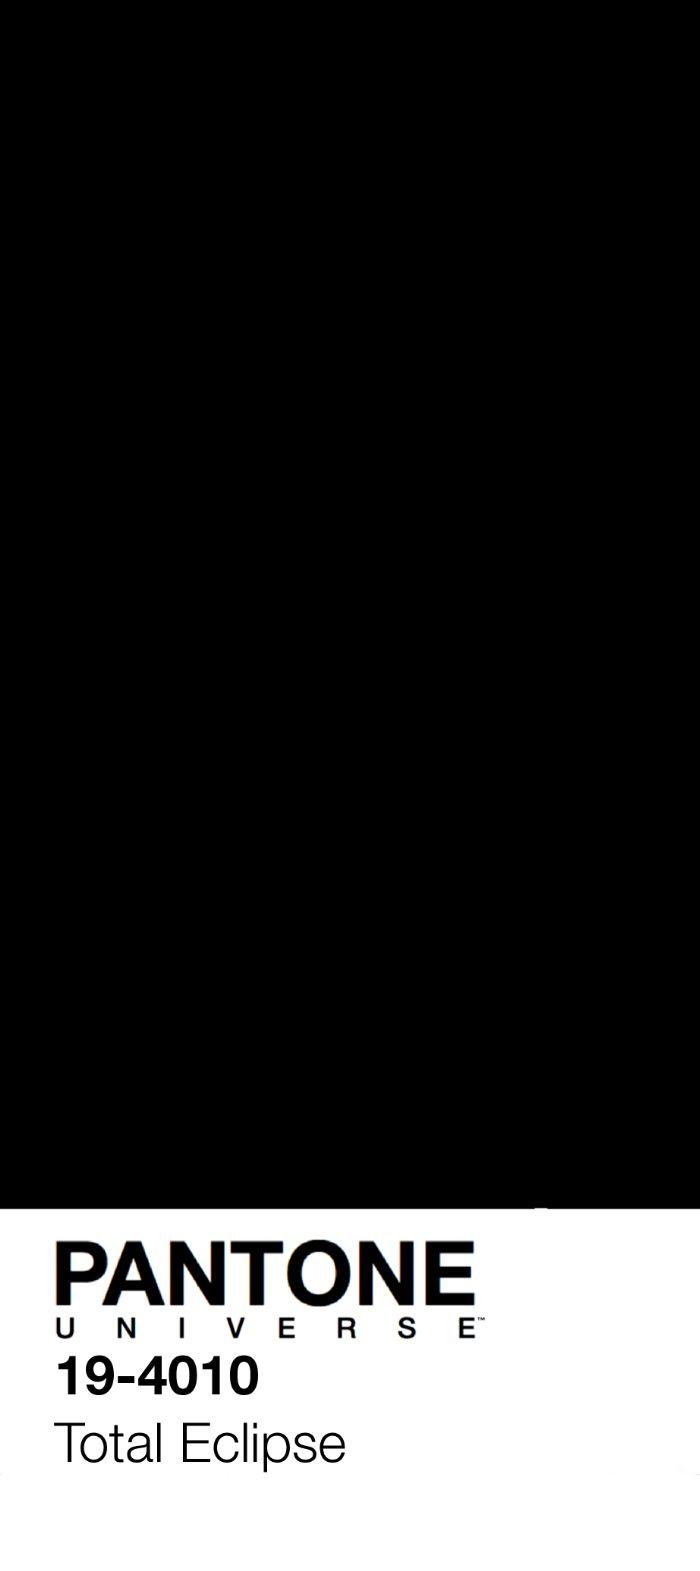 PANTONE Total Eclipse by NESOI | Pantone Parody в 2019 г ...